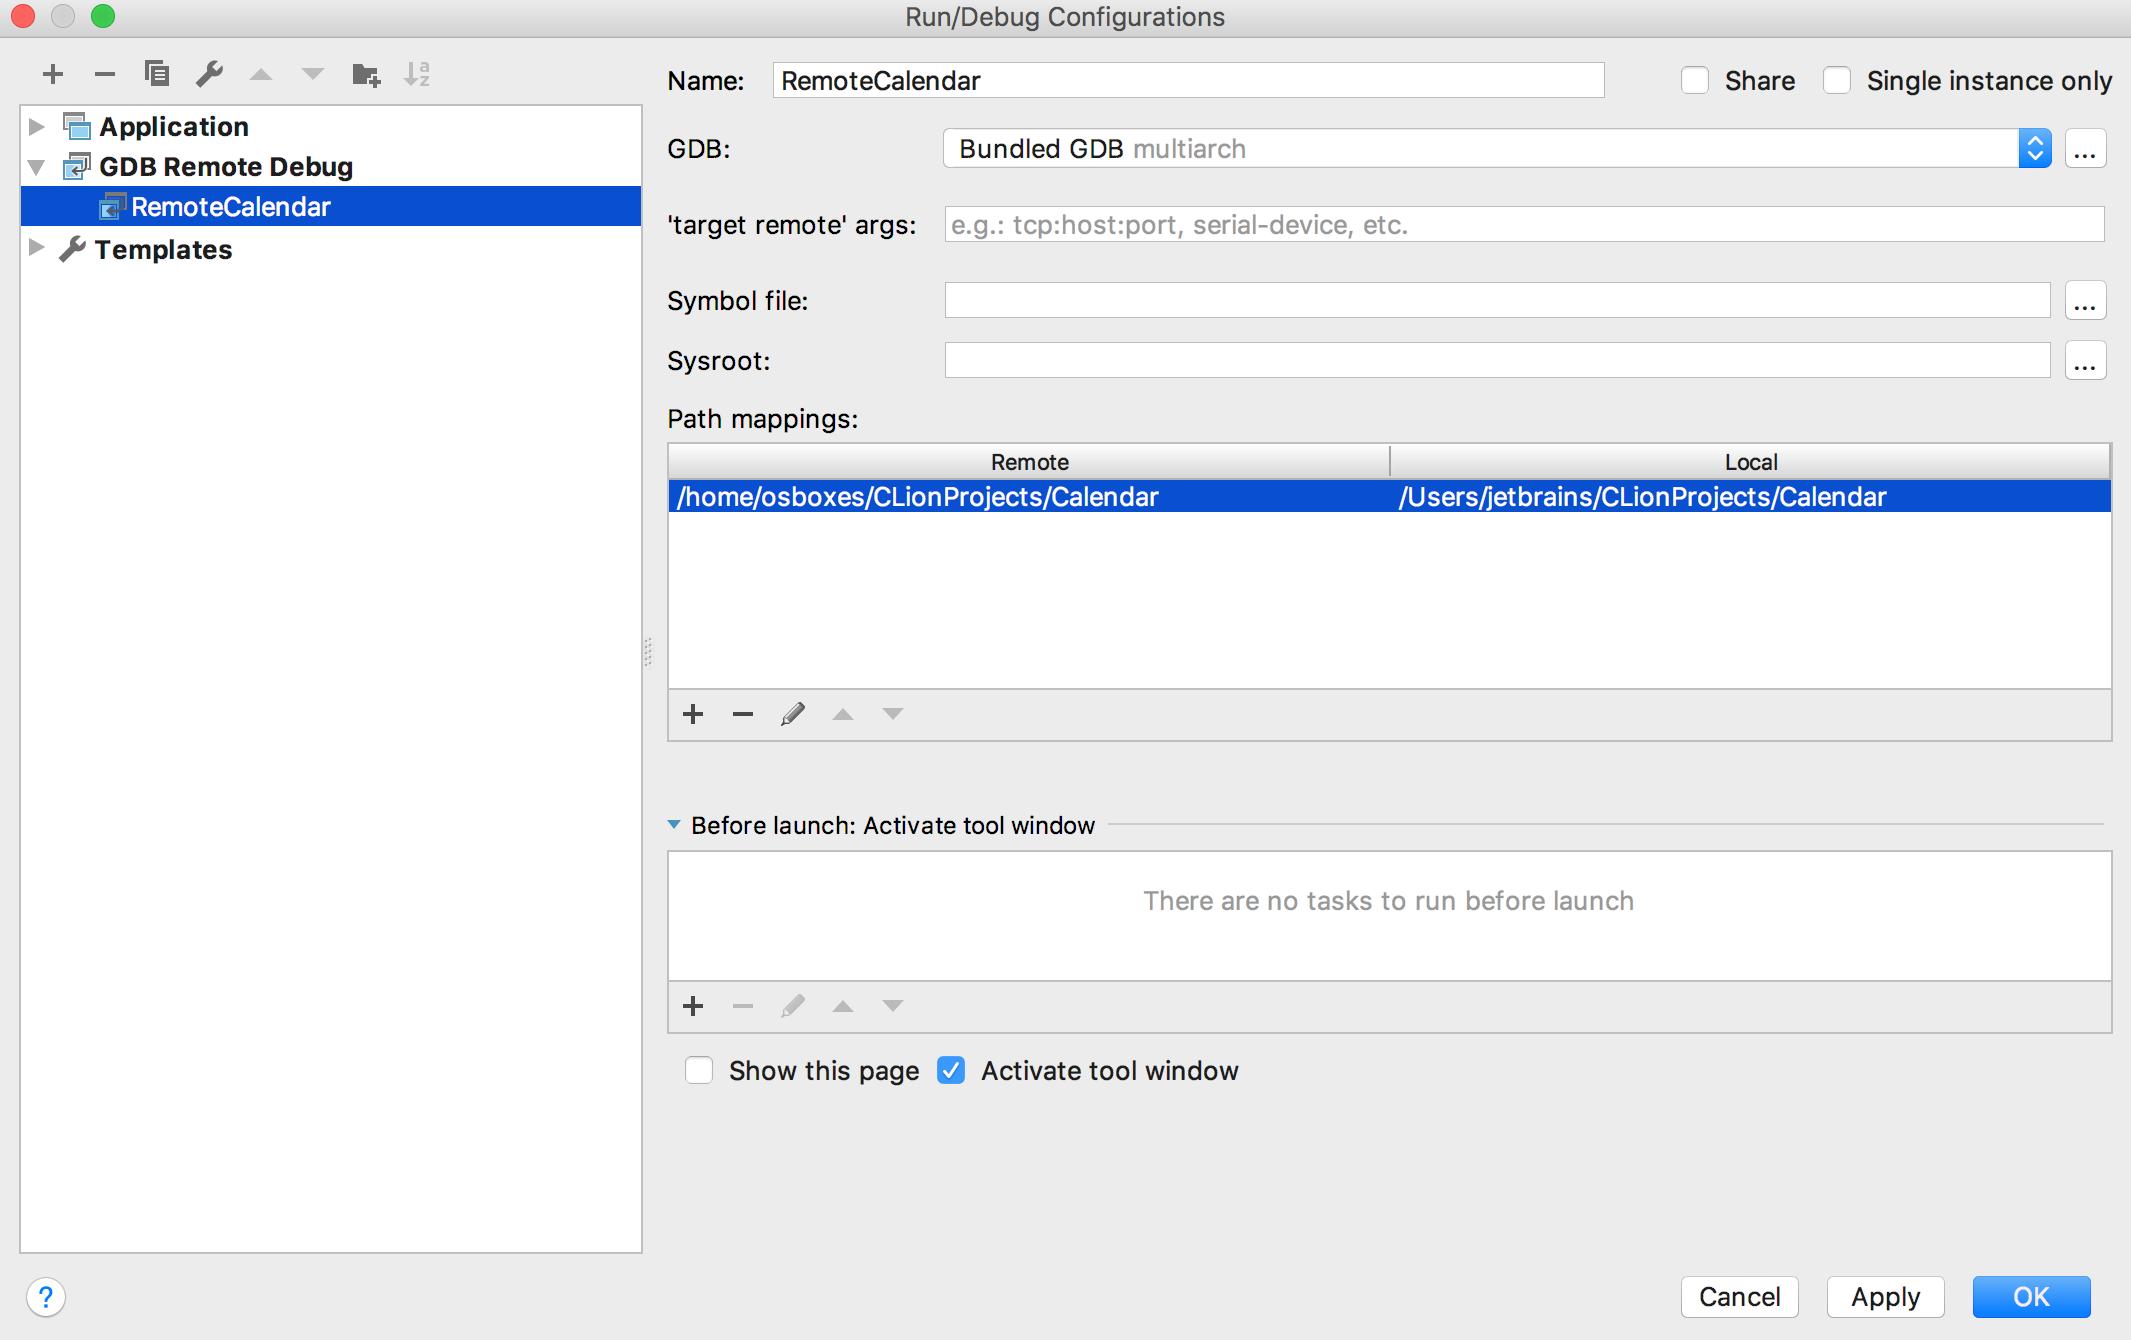 Remote Run/Debug Configuration